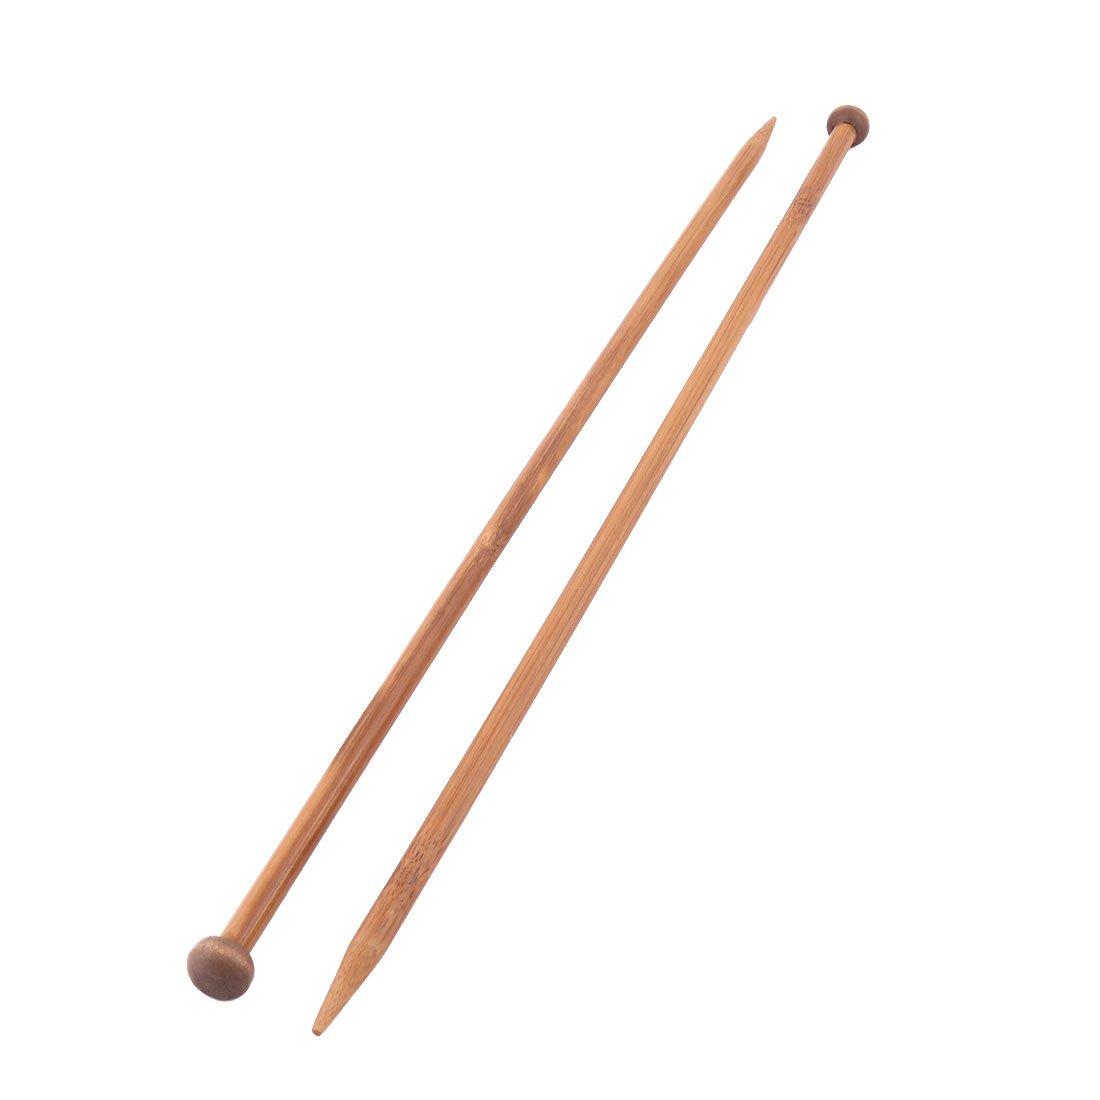 uxcell Bamboo Home Bedroom Handmade DIY Gloves Socks Knitting Braided Needles 10mm Dia 2 Pcs a17070300ux0855